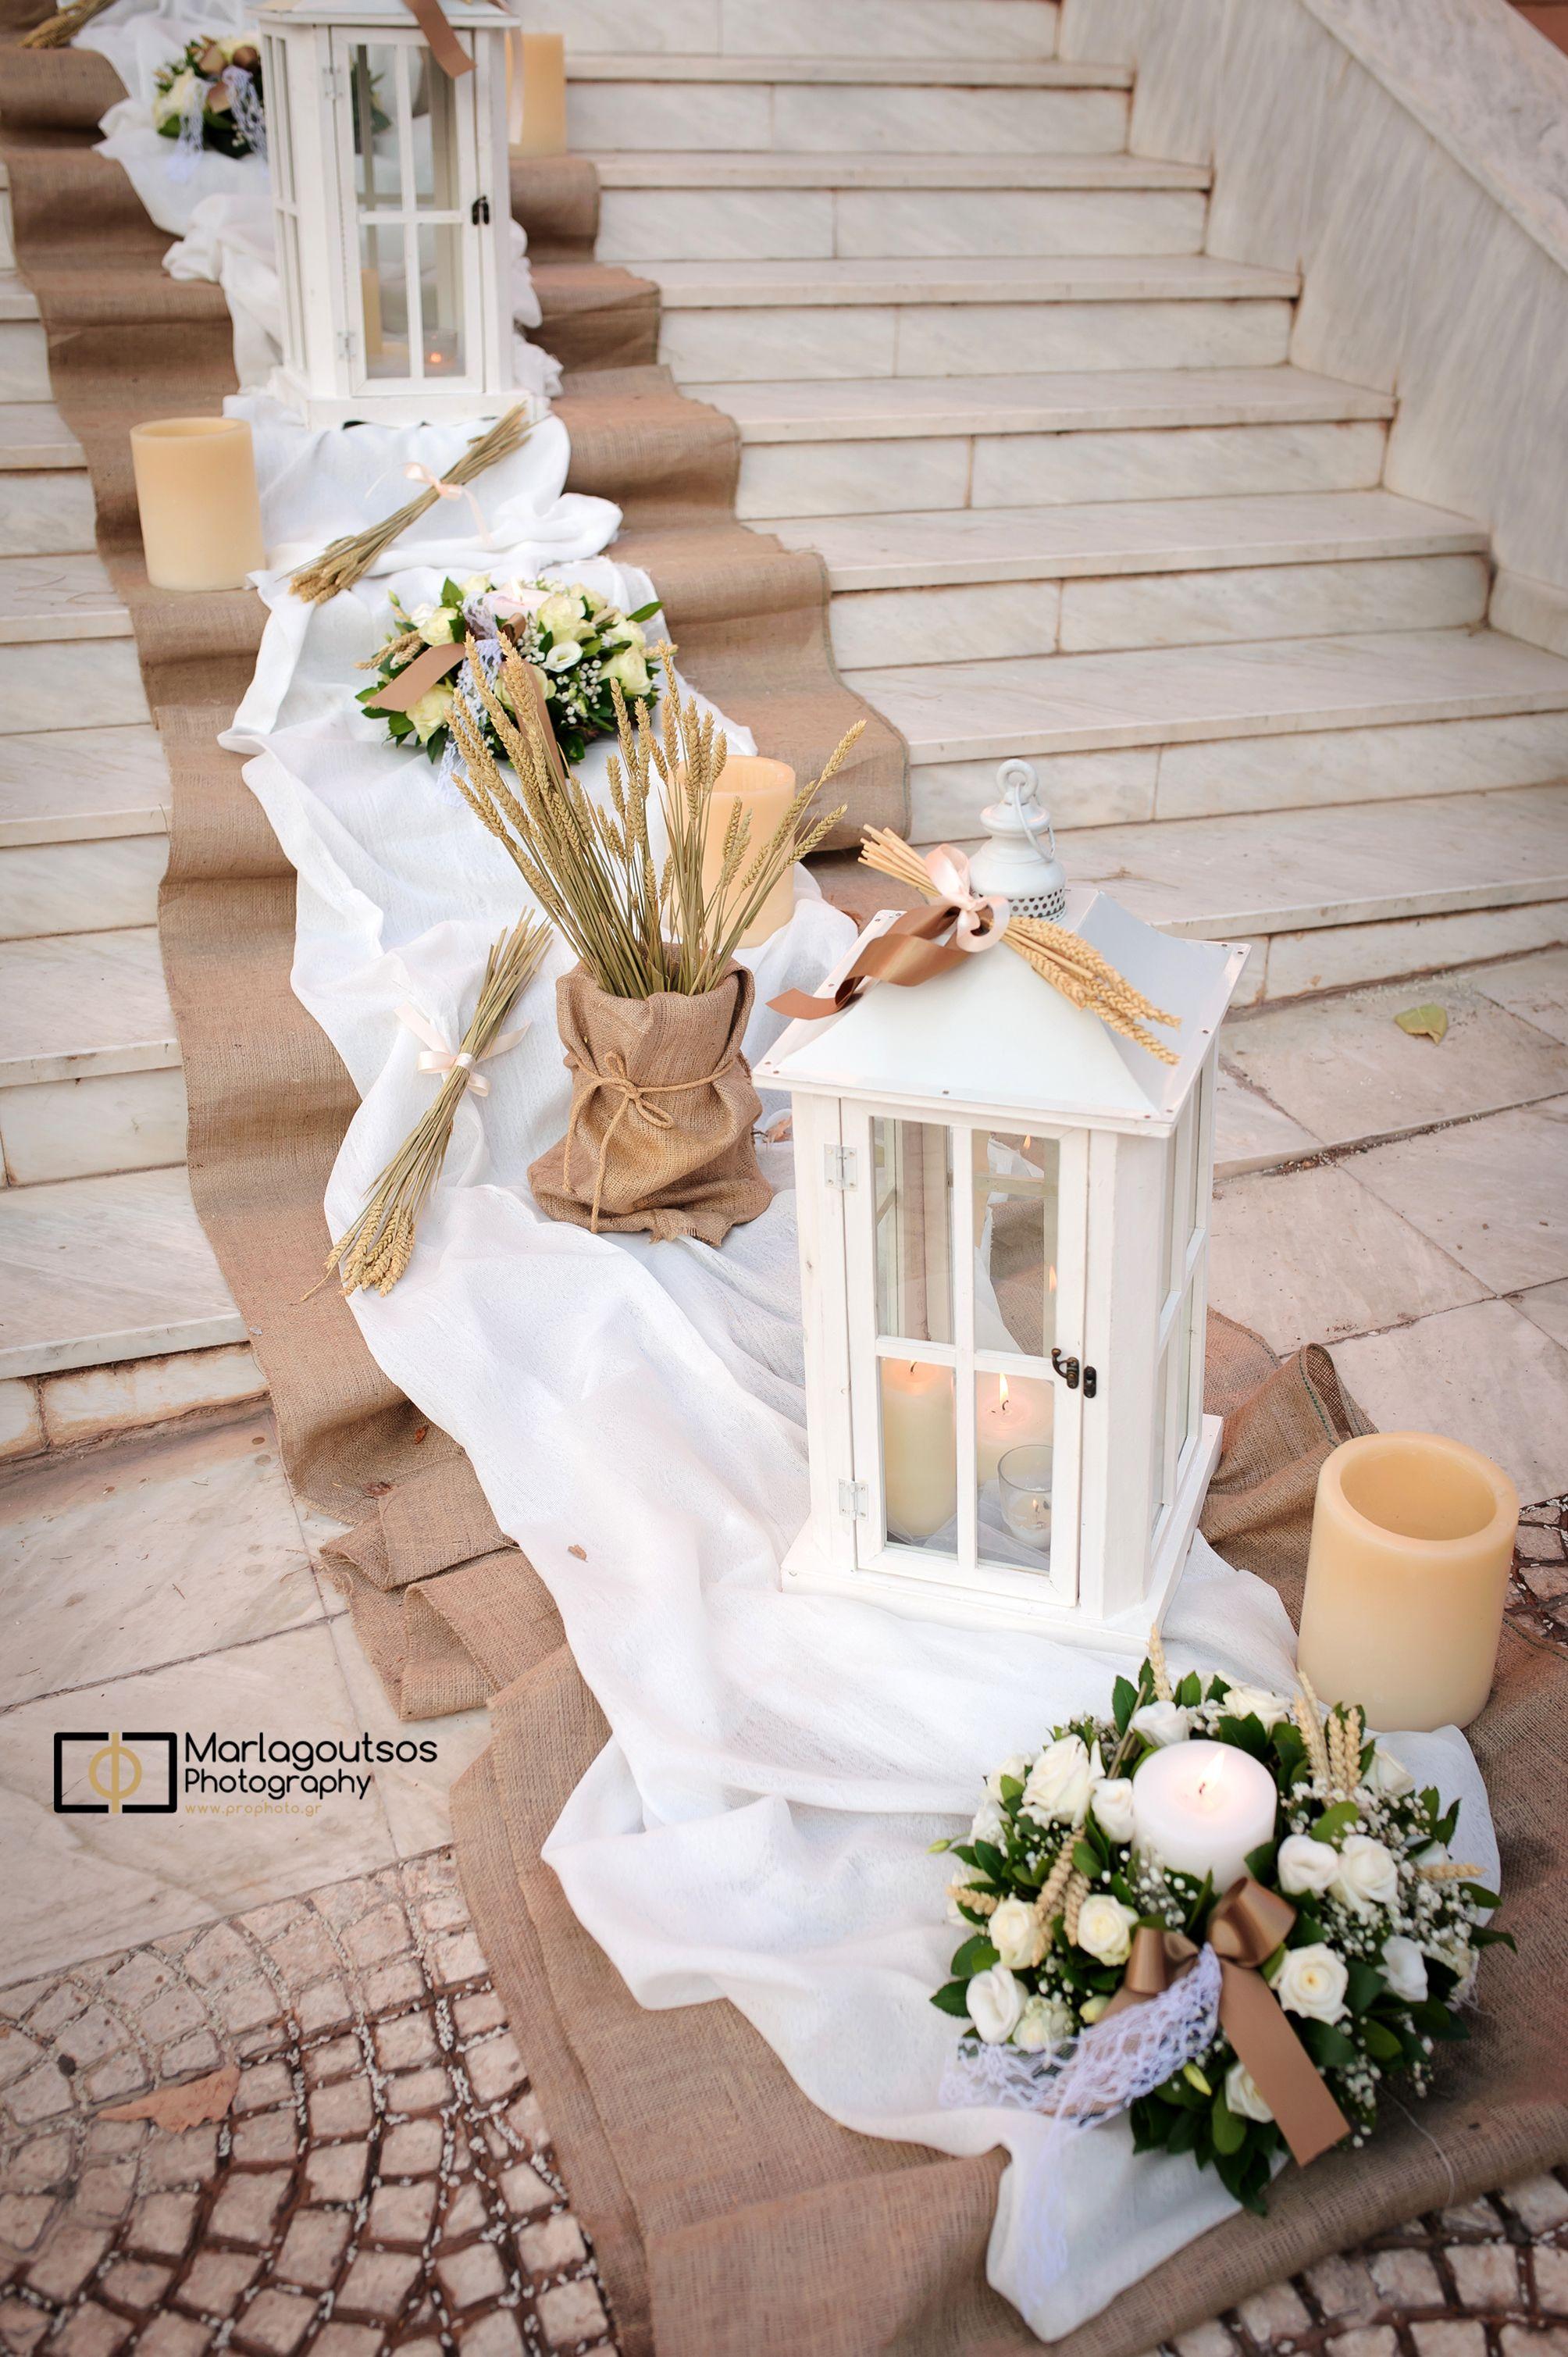 e3ea47a8f113 Vintage Στολισμός γάμου με αρωματικά φυτά στην Αγία Τριάδα στη Ν.Κηφησιά.  Vintage μπομπονιέρες